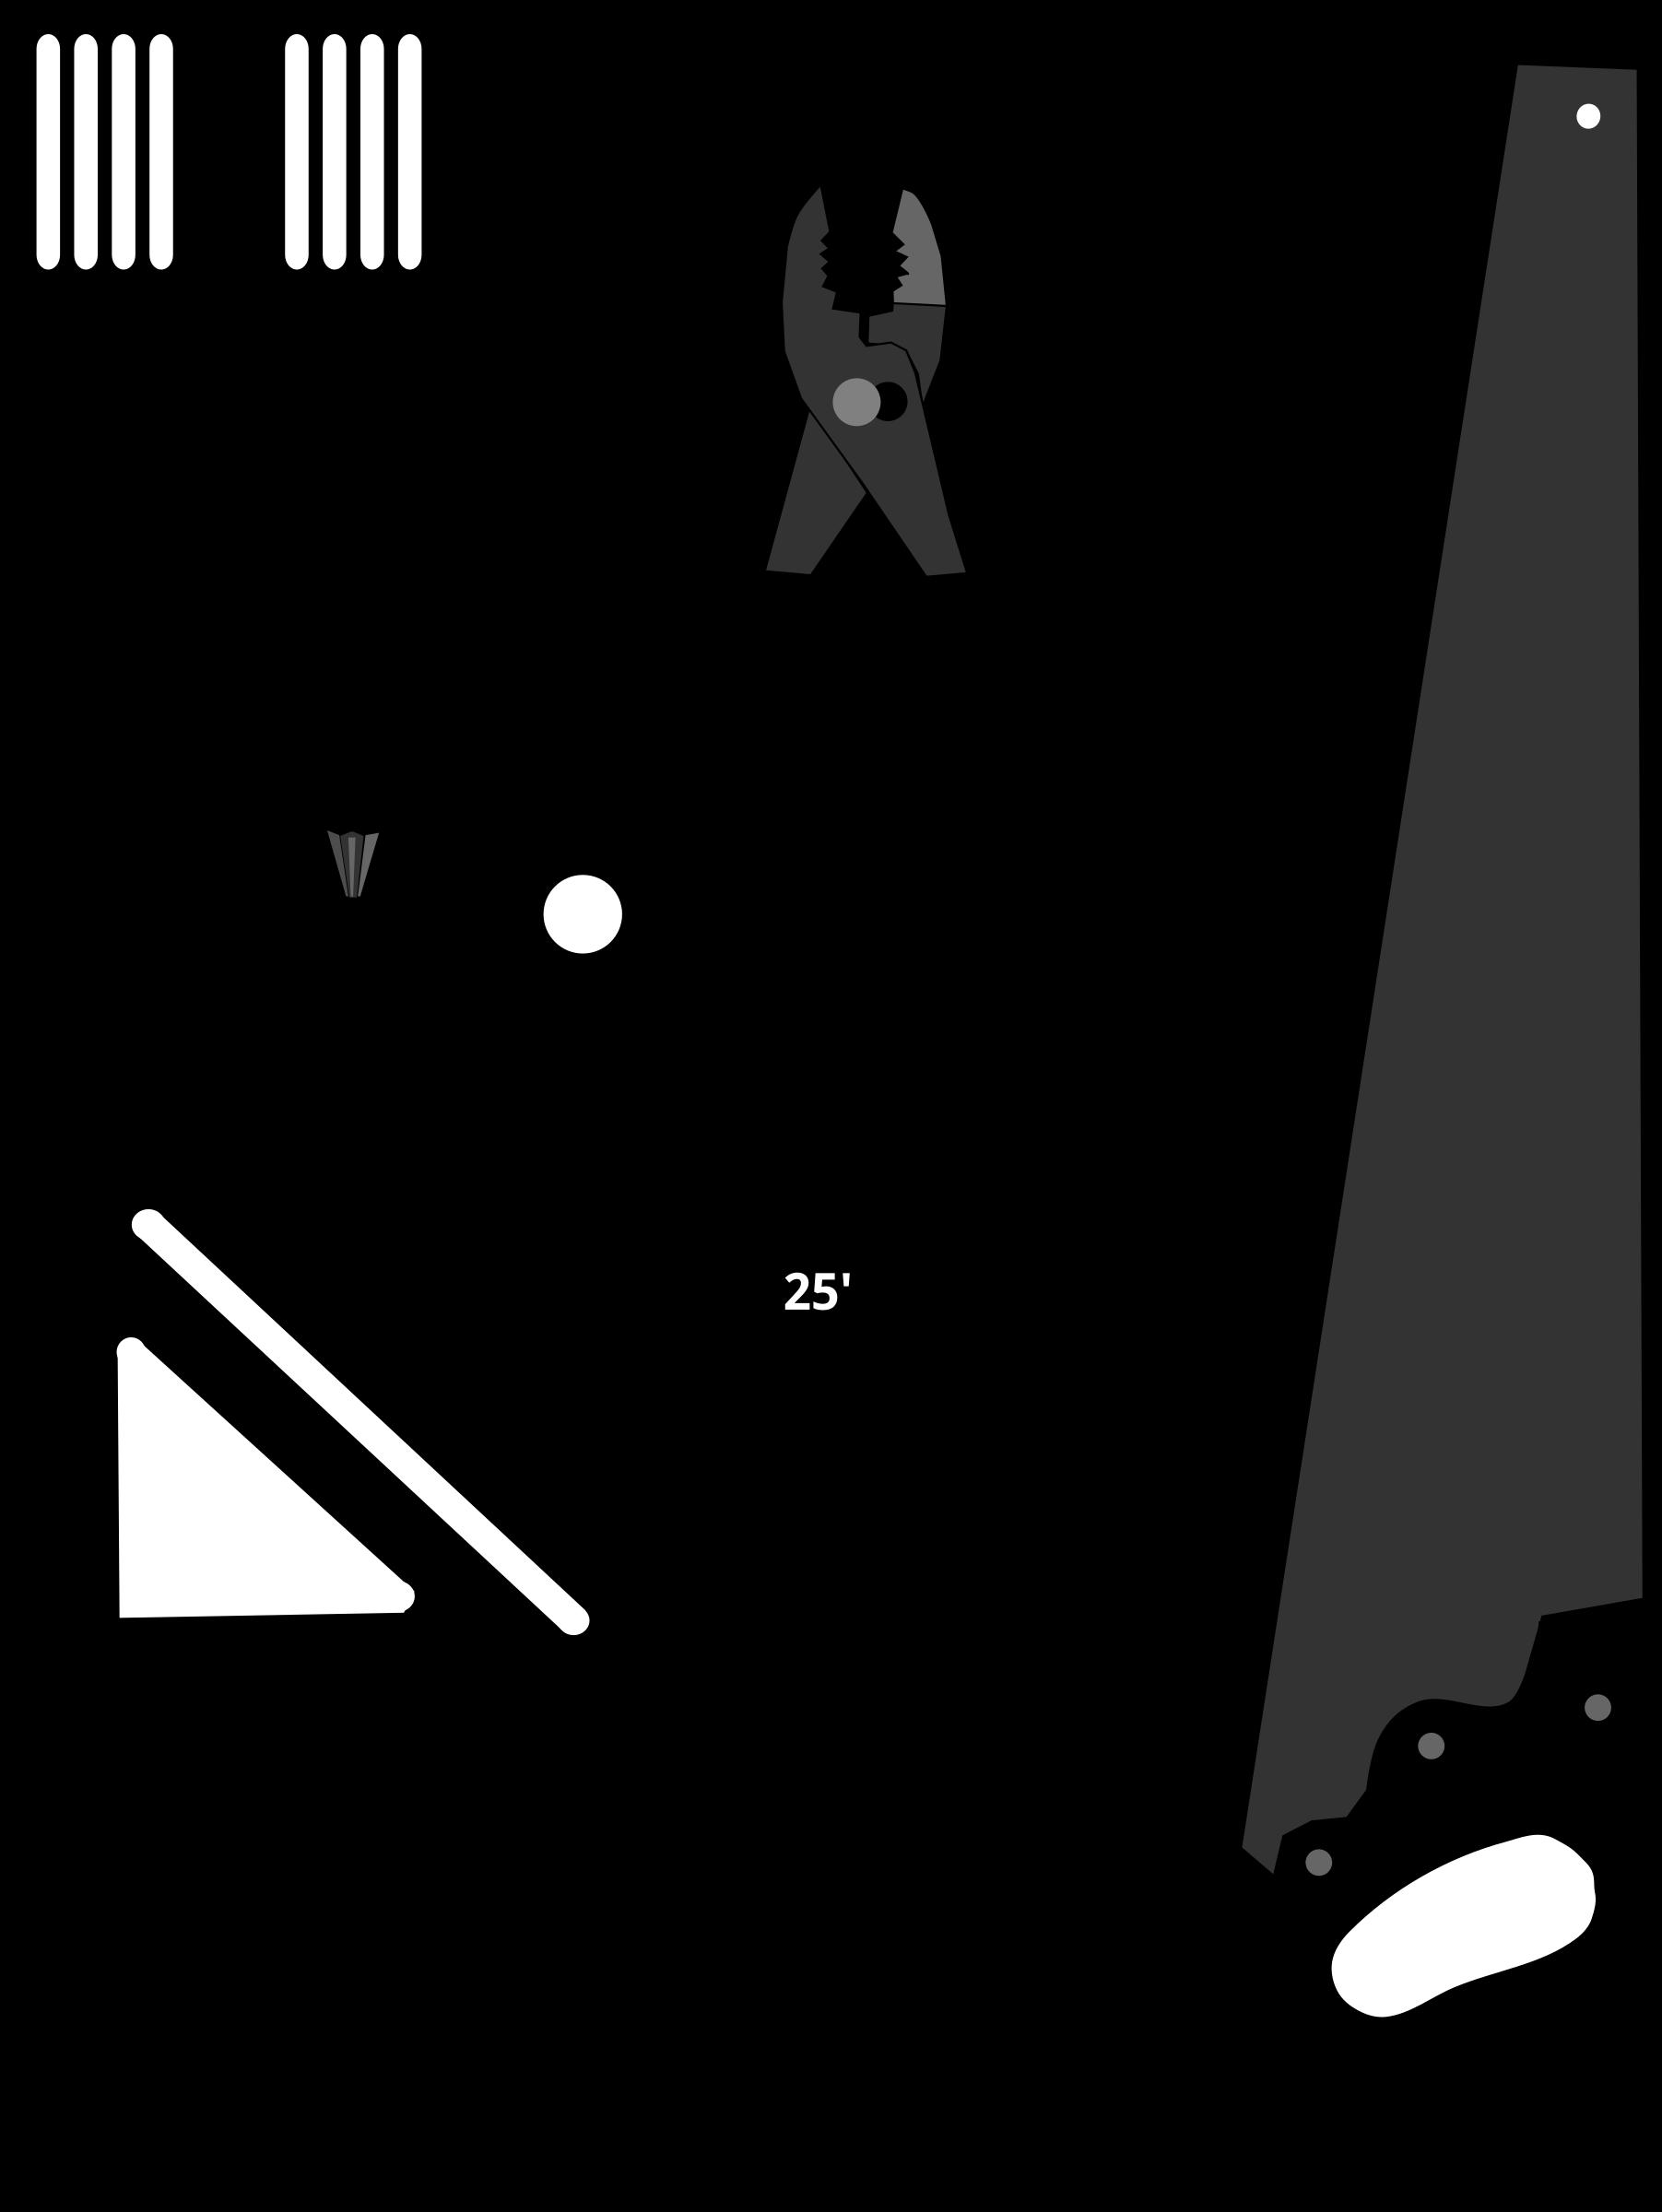 Basic Tools (silhouettes) by algotruneman, Set of basic